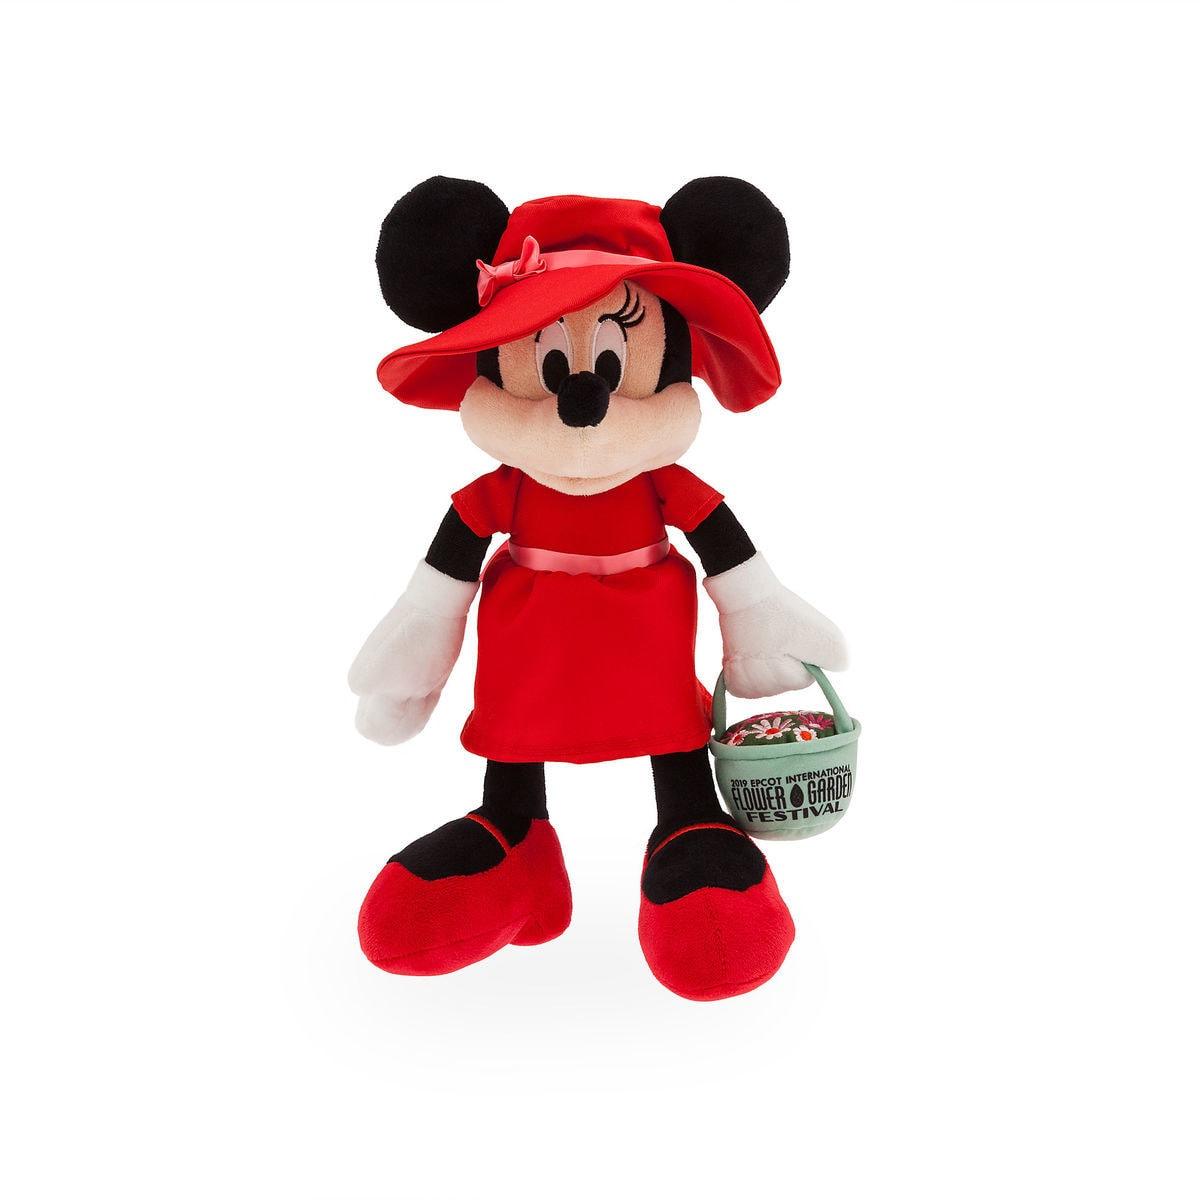 Christmas Minnie Ears 2019.Disney Plush 2019 Epcot Flower And Garden Festival Minnie Mouse